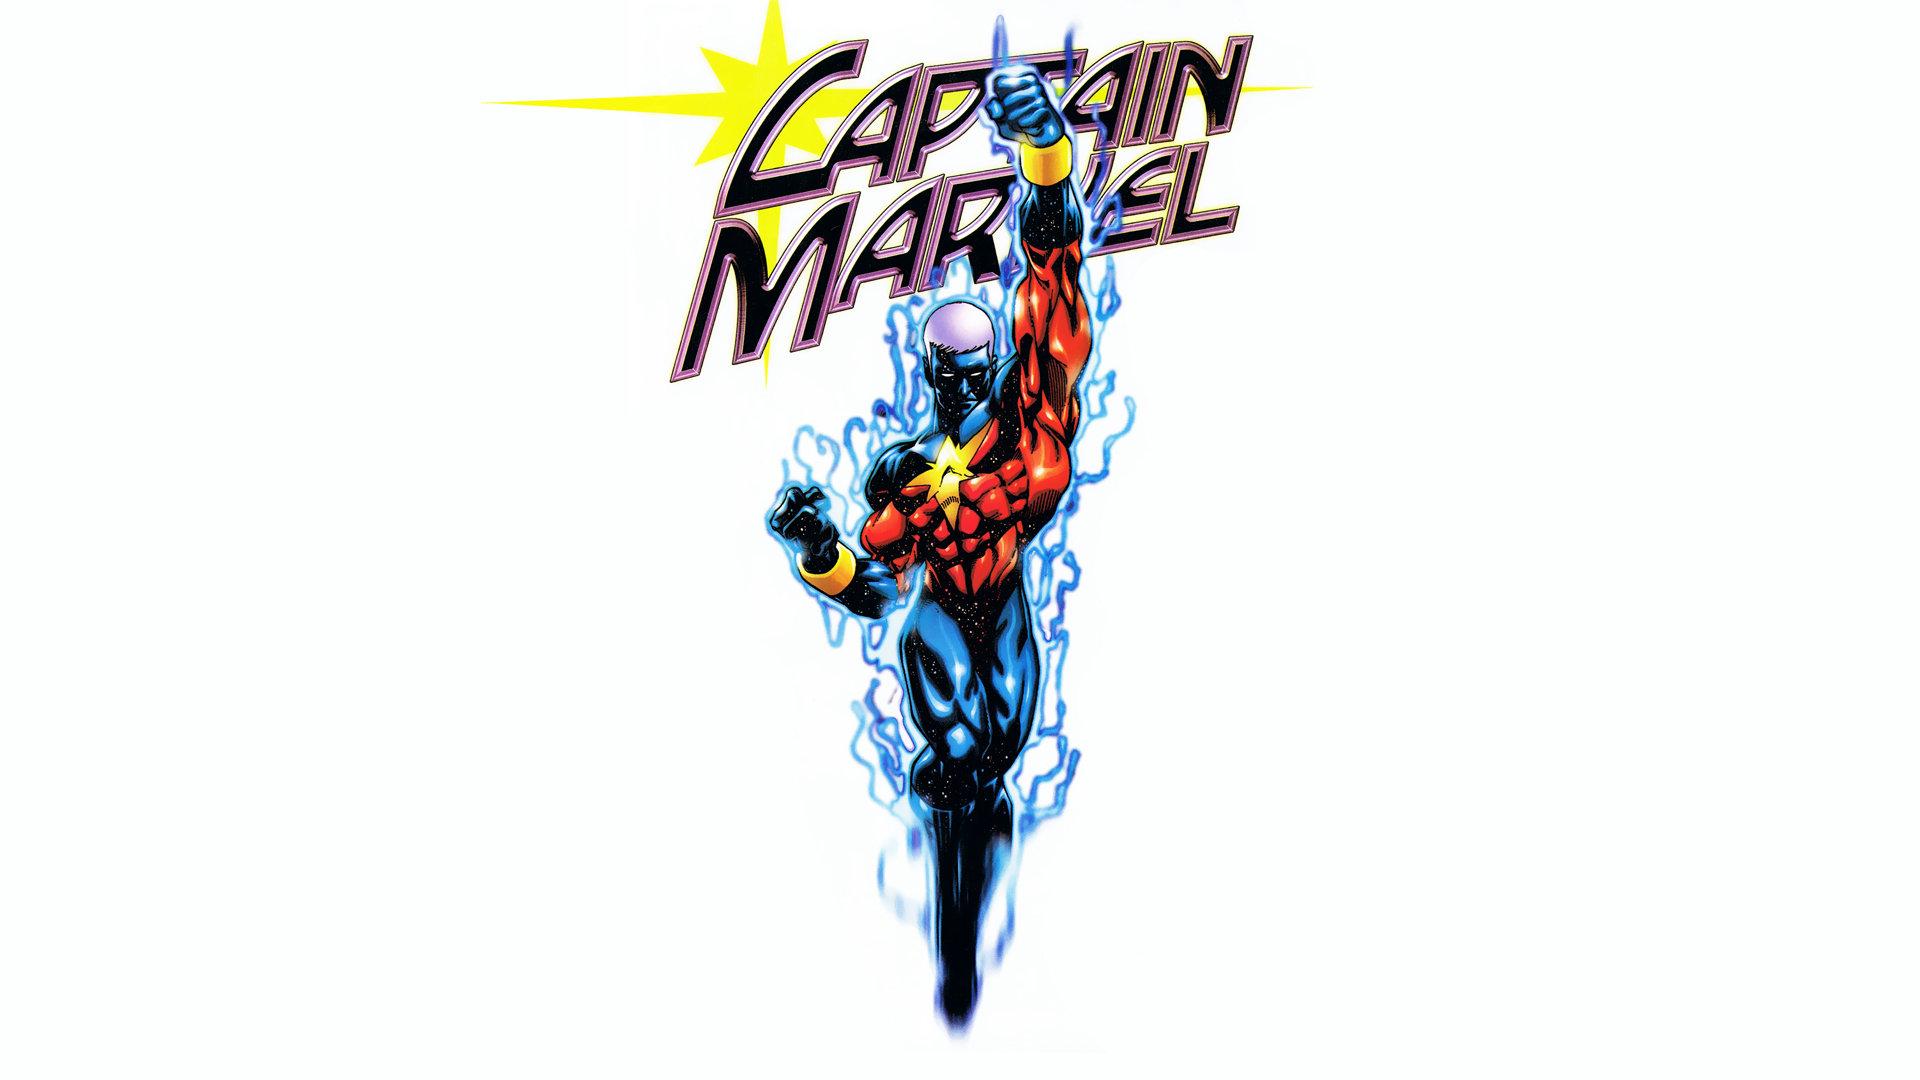 Captain Marvel wallpapers 1920x1080 Full HD (1080p ...